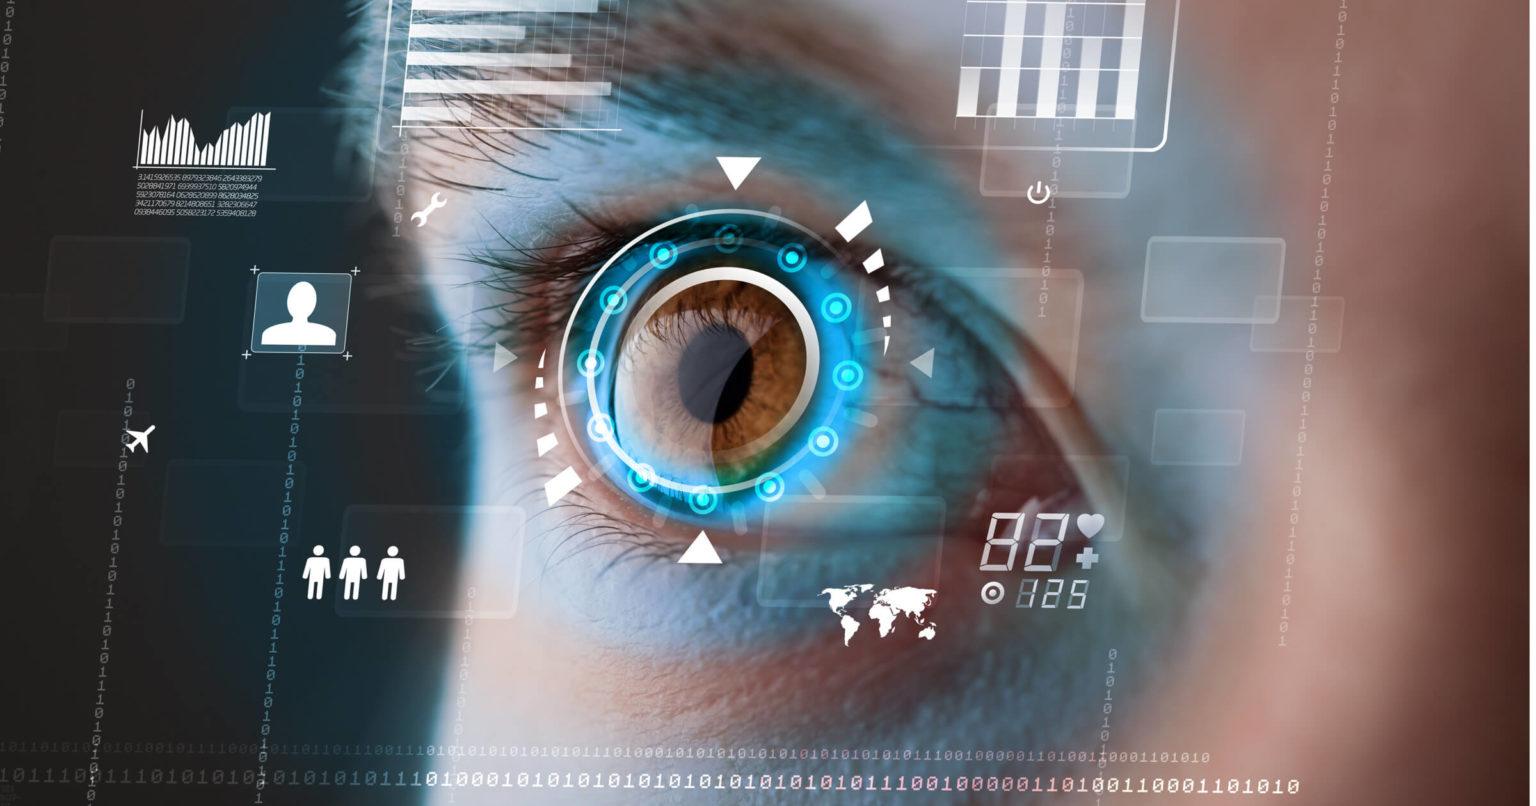 Intel & Udacity To Launch New Edge AI Program To Train The Developer Community